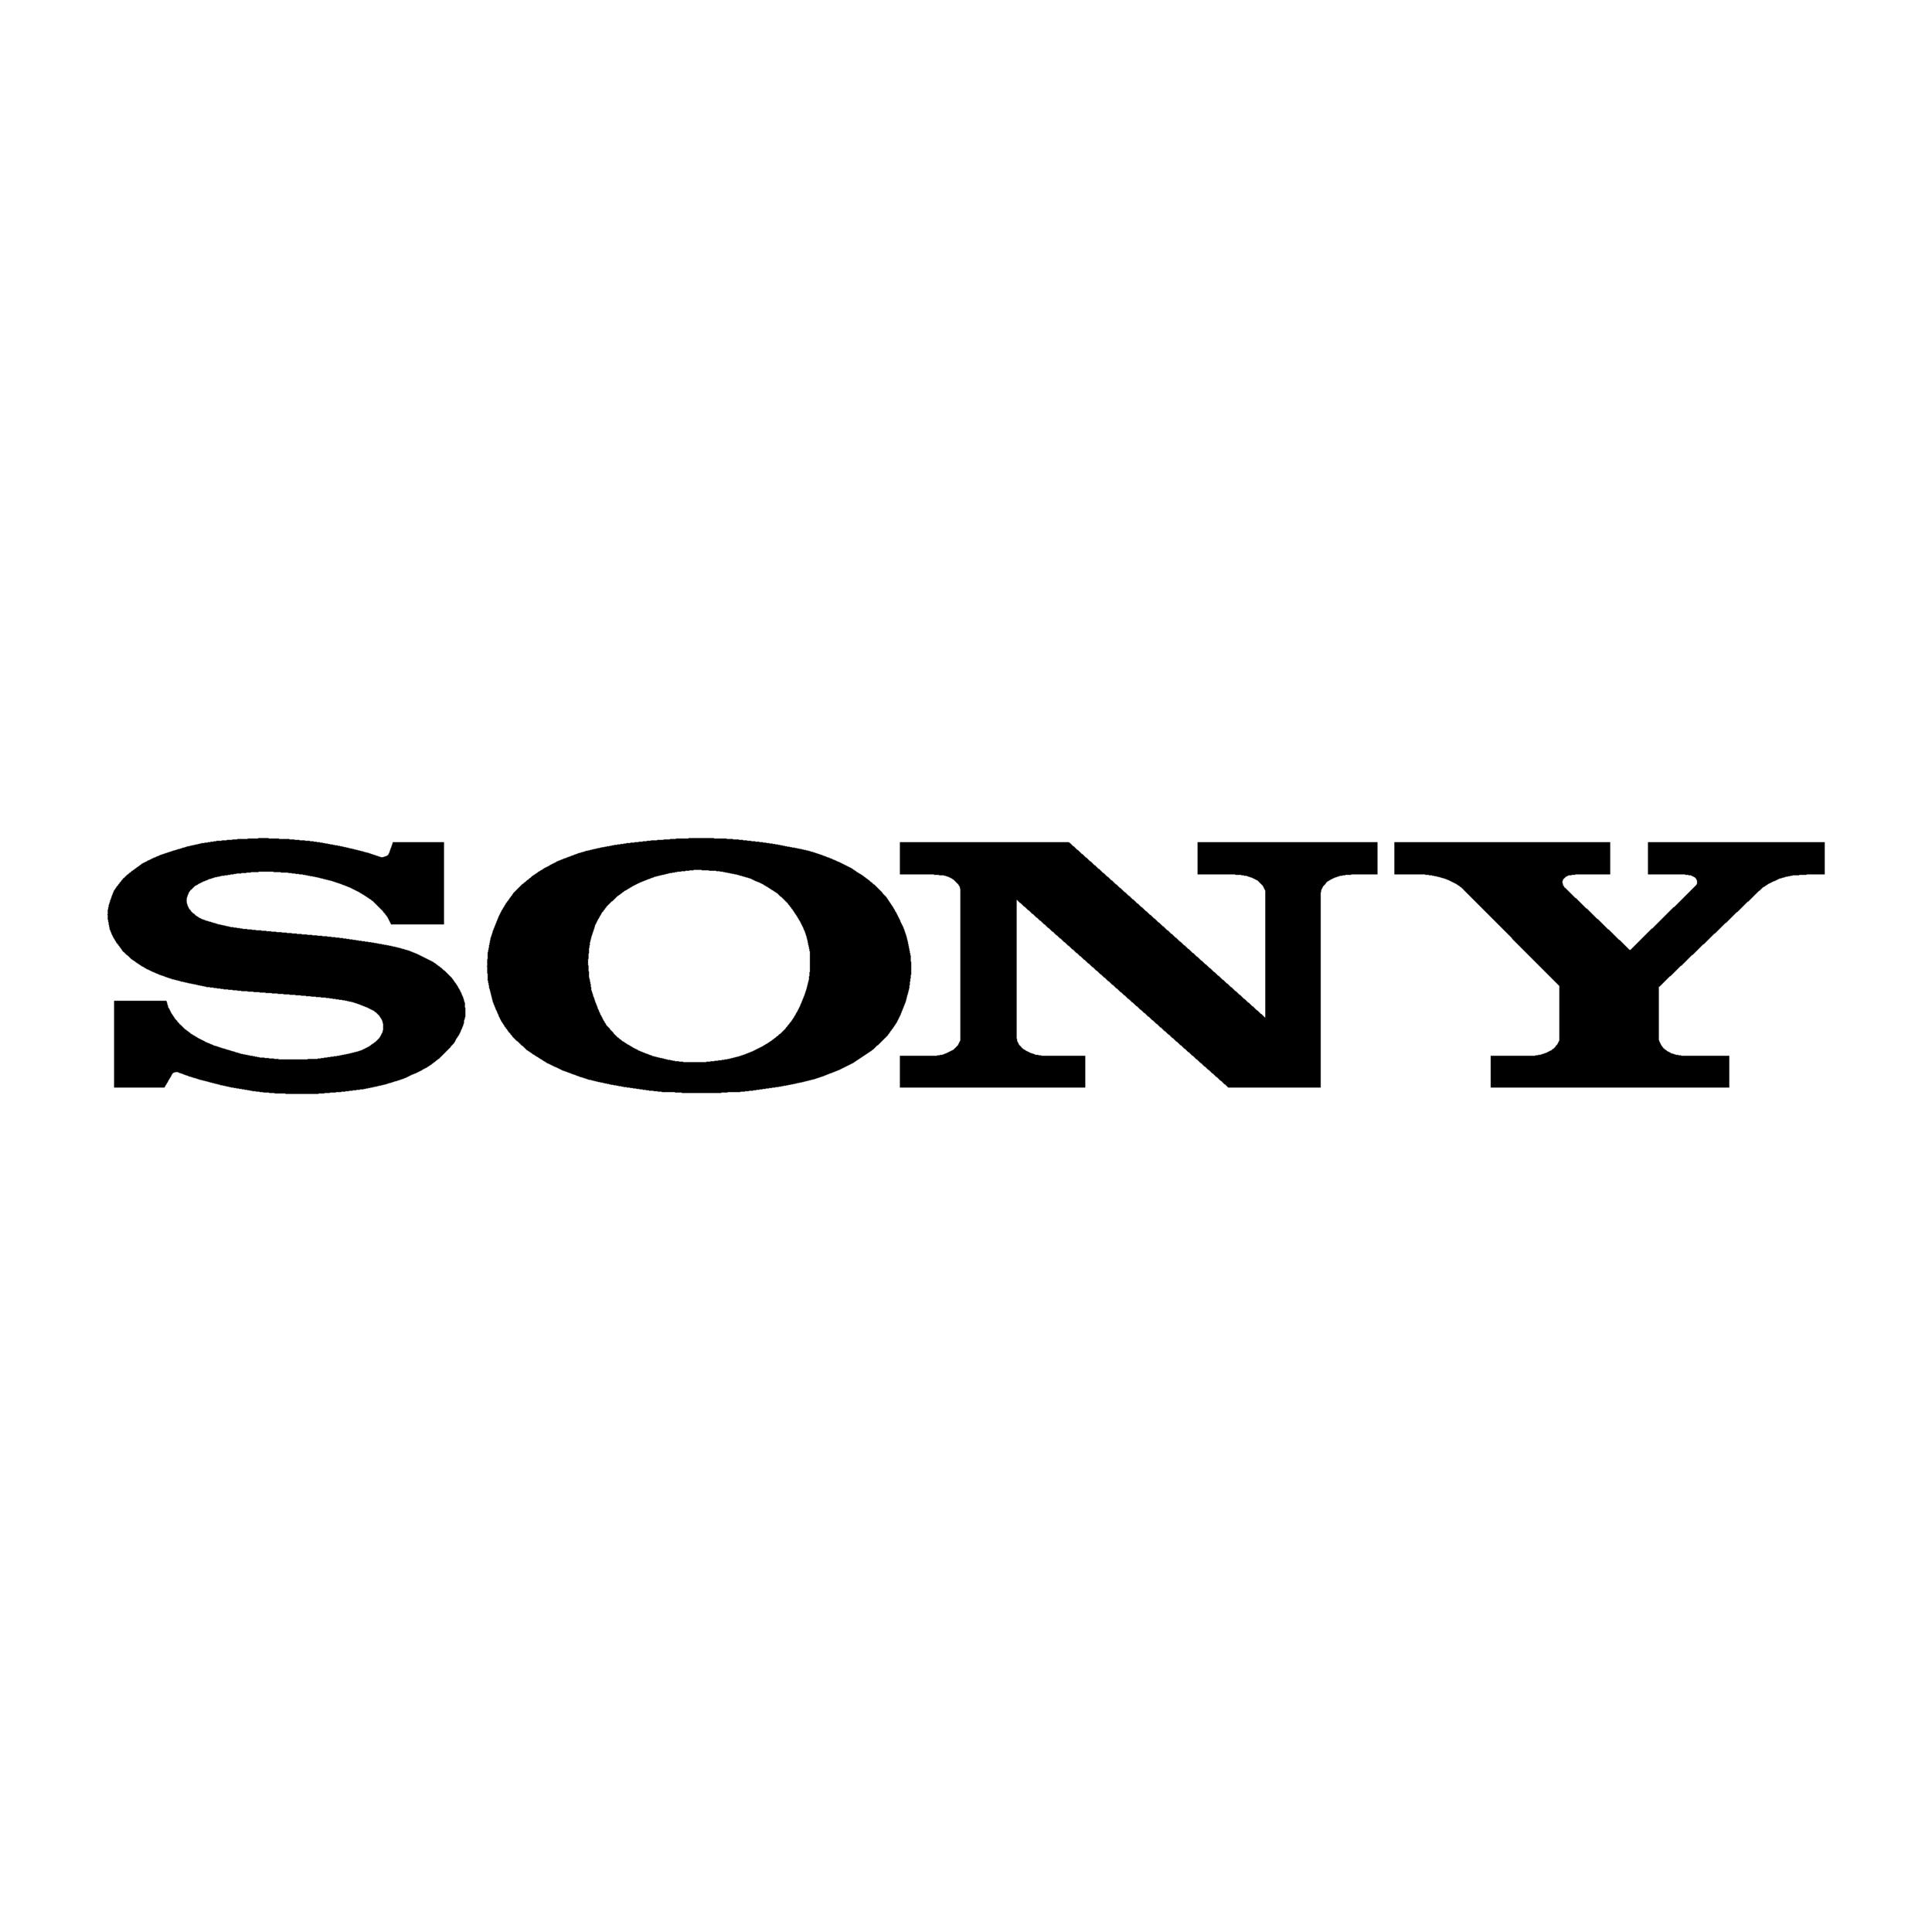 sticker-sony-ref-1-tuning-audio-sonorisation-car-auto-moto-camion-competition-deco-rallye-autocollant-min